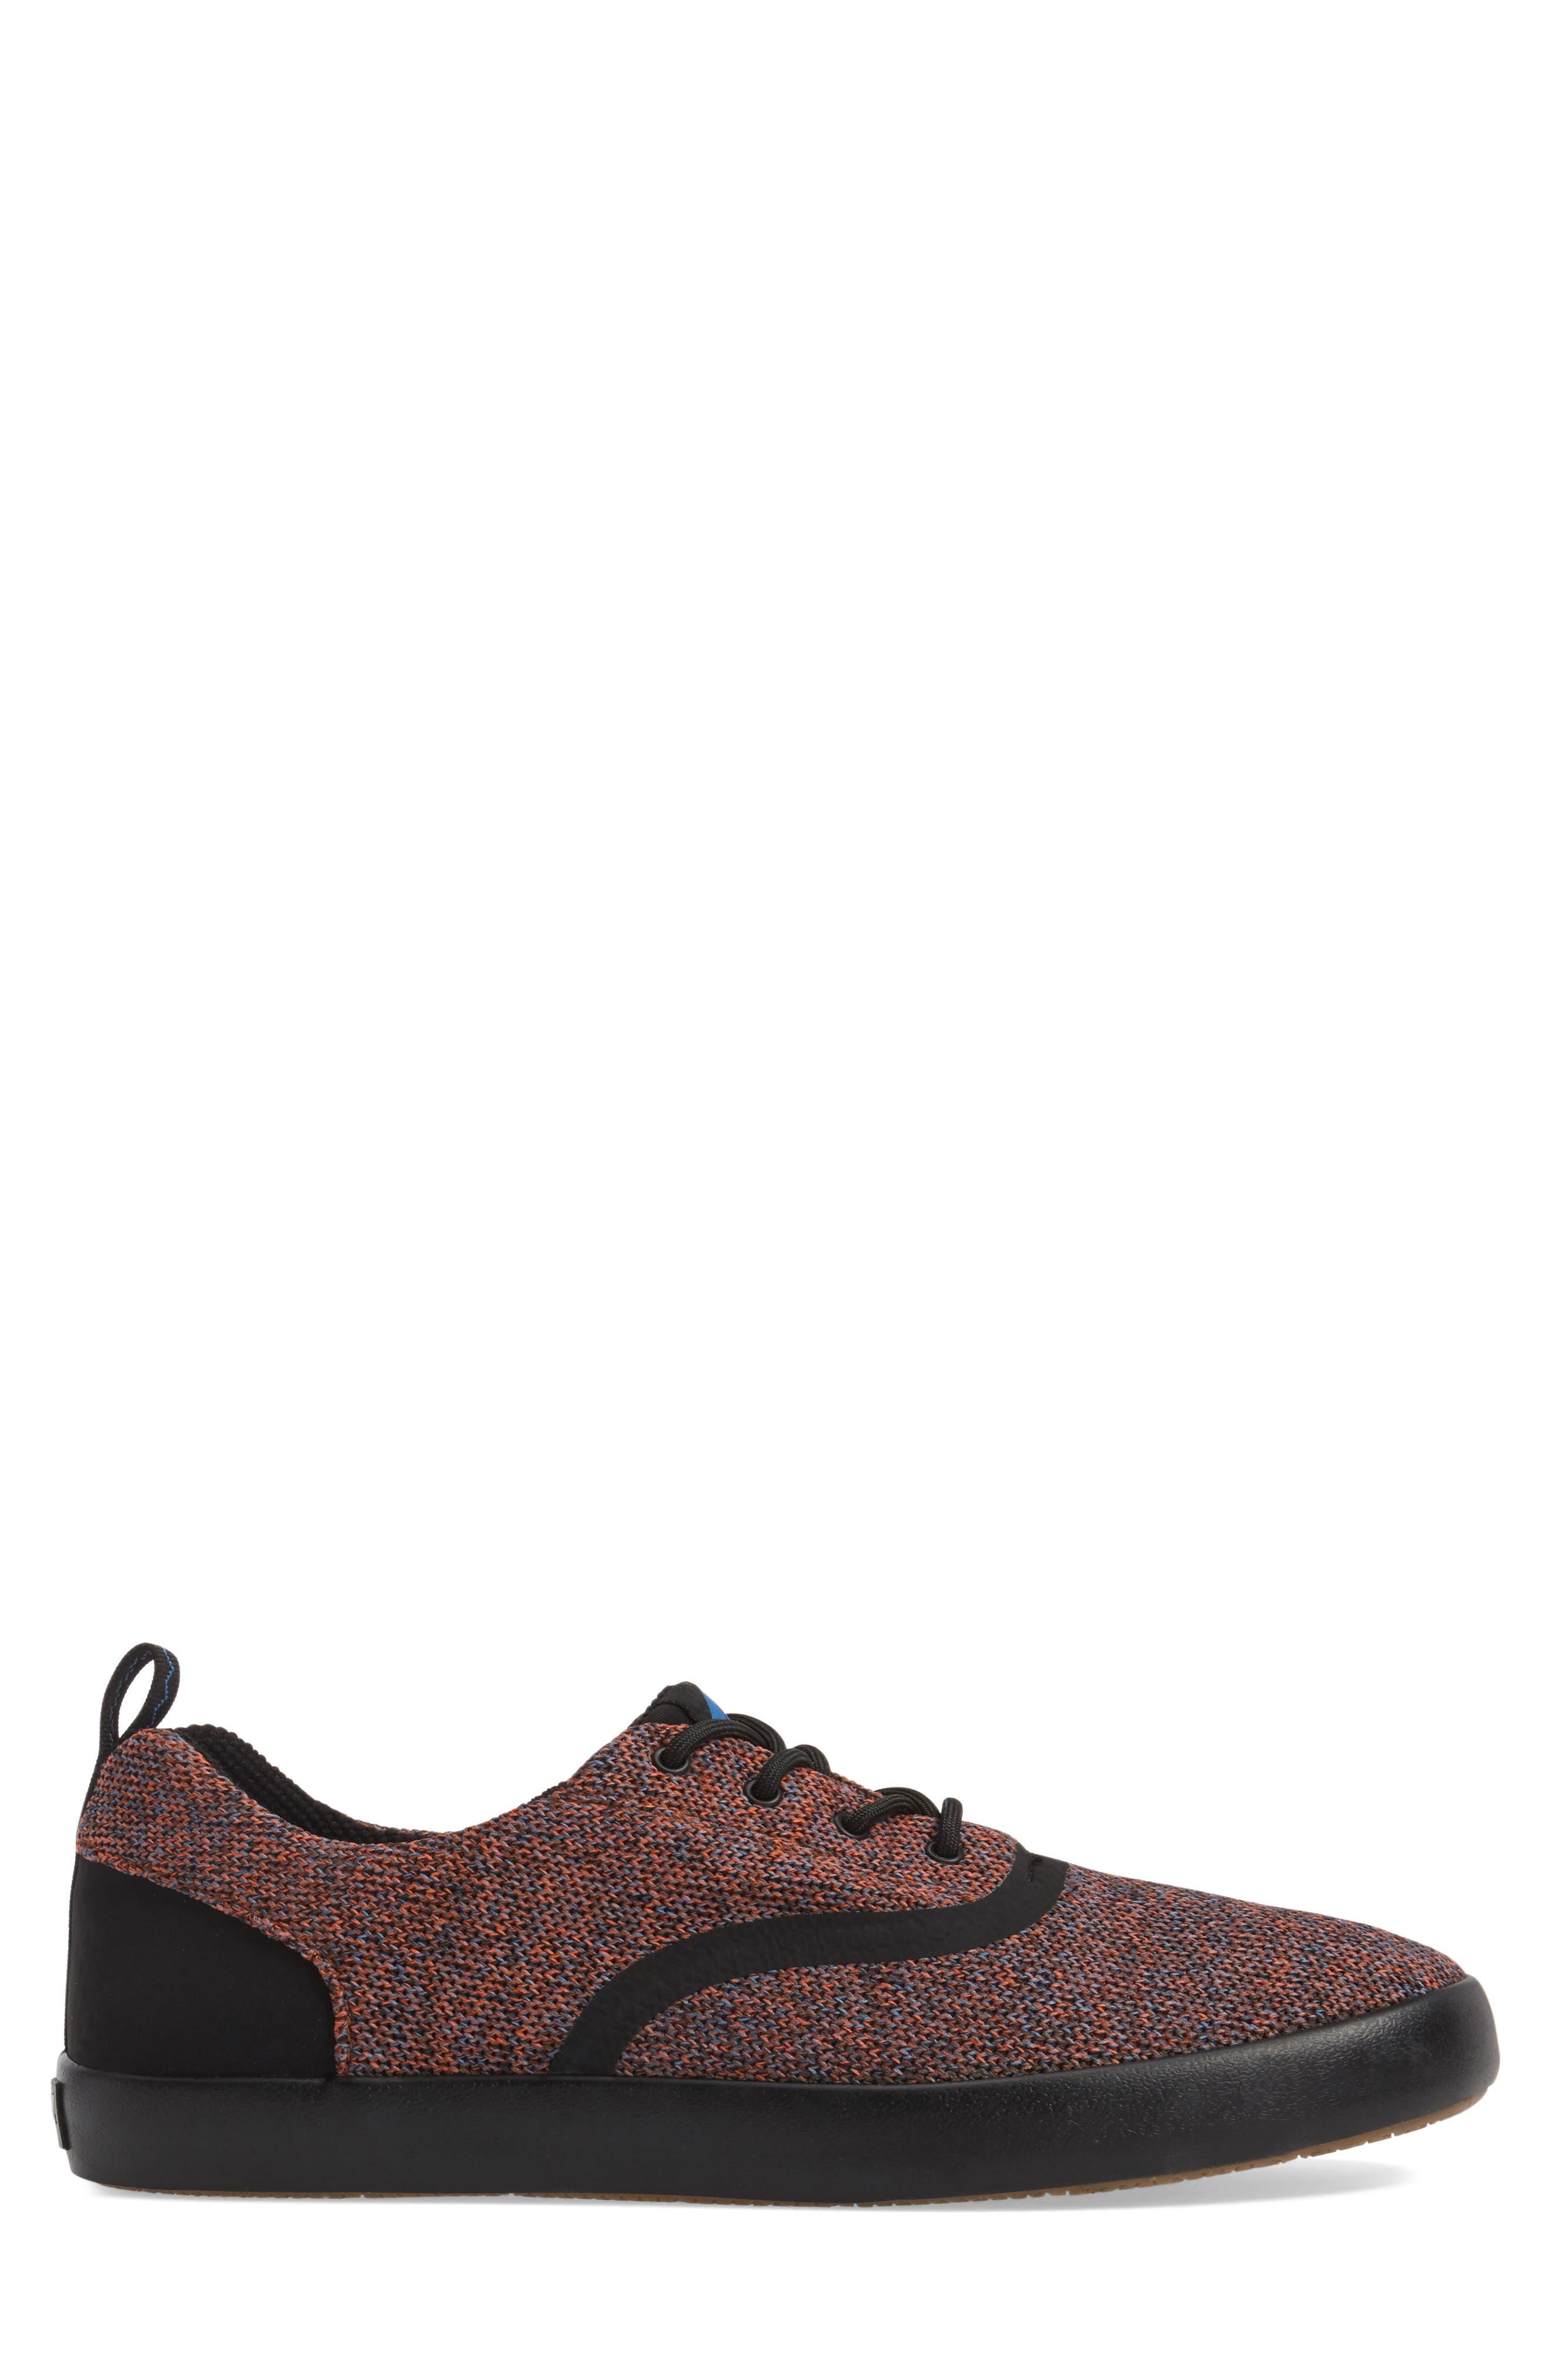 Alternate Image 3  - Paul Sperry Flex Deck Sneaker (Men)